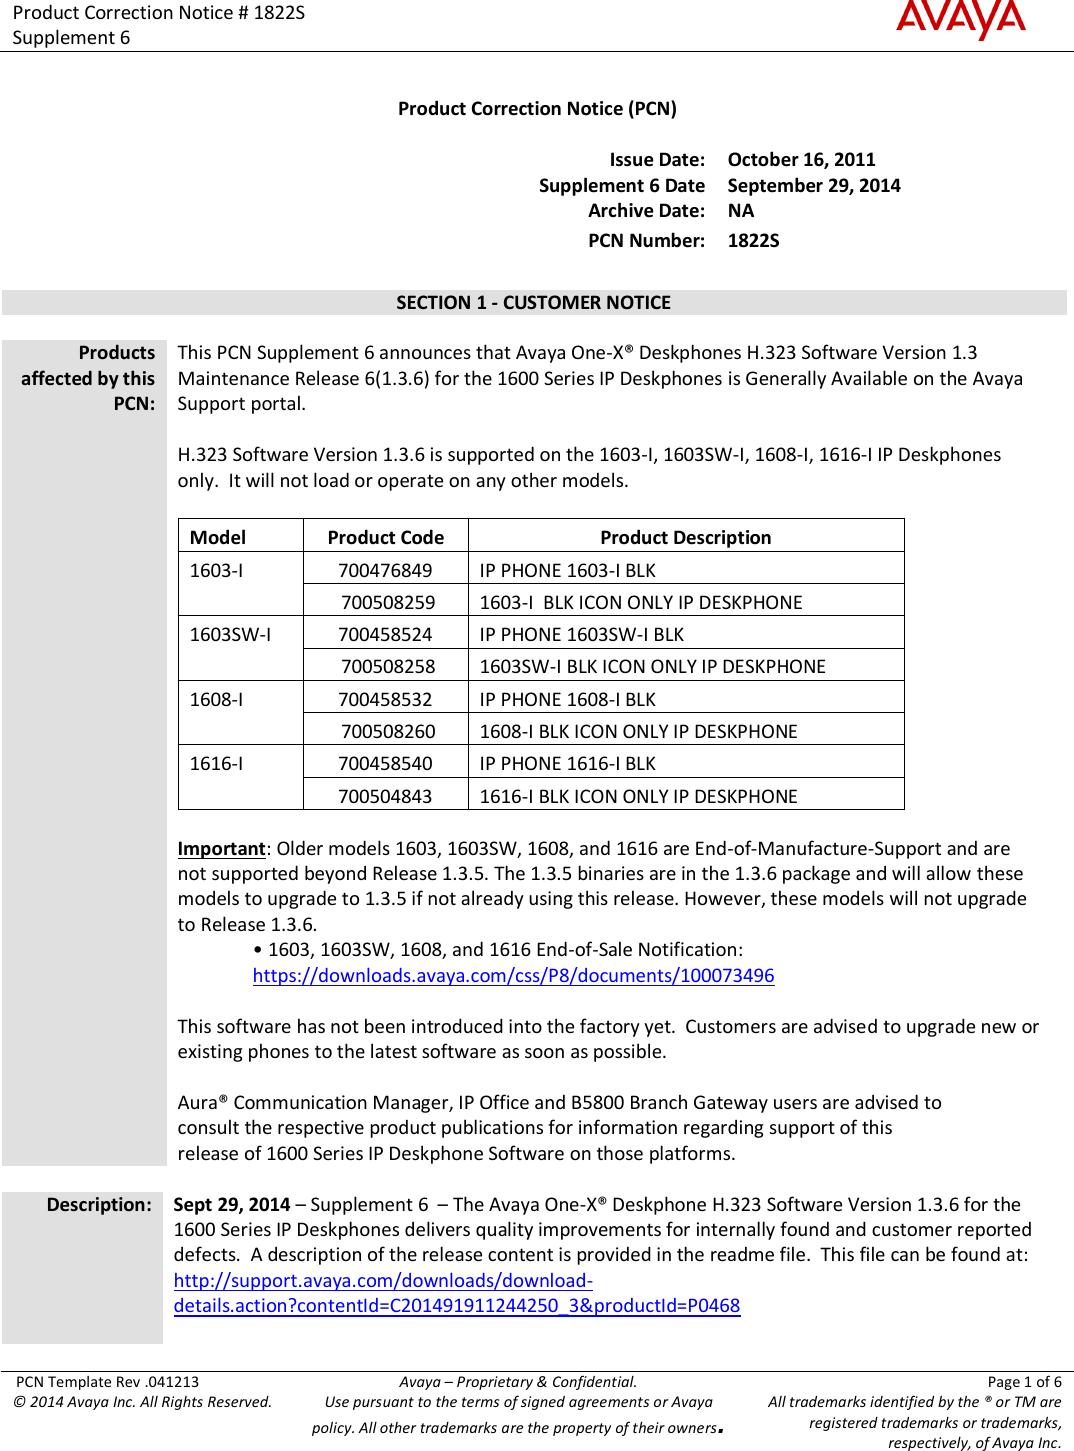 Avaya Pcn1822Su Users Manual Product Correction Notice